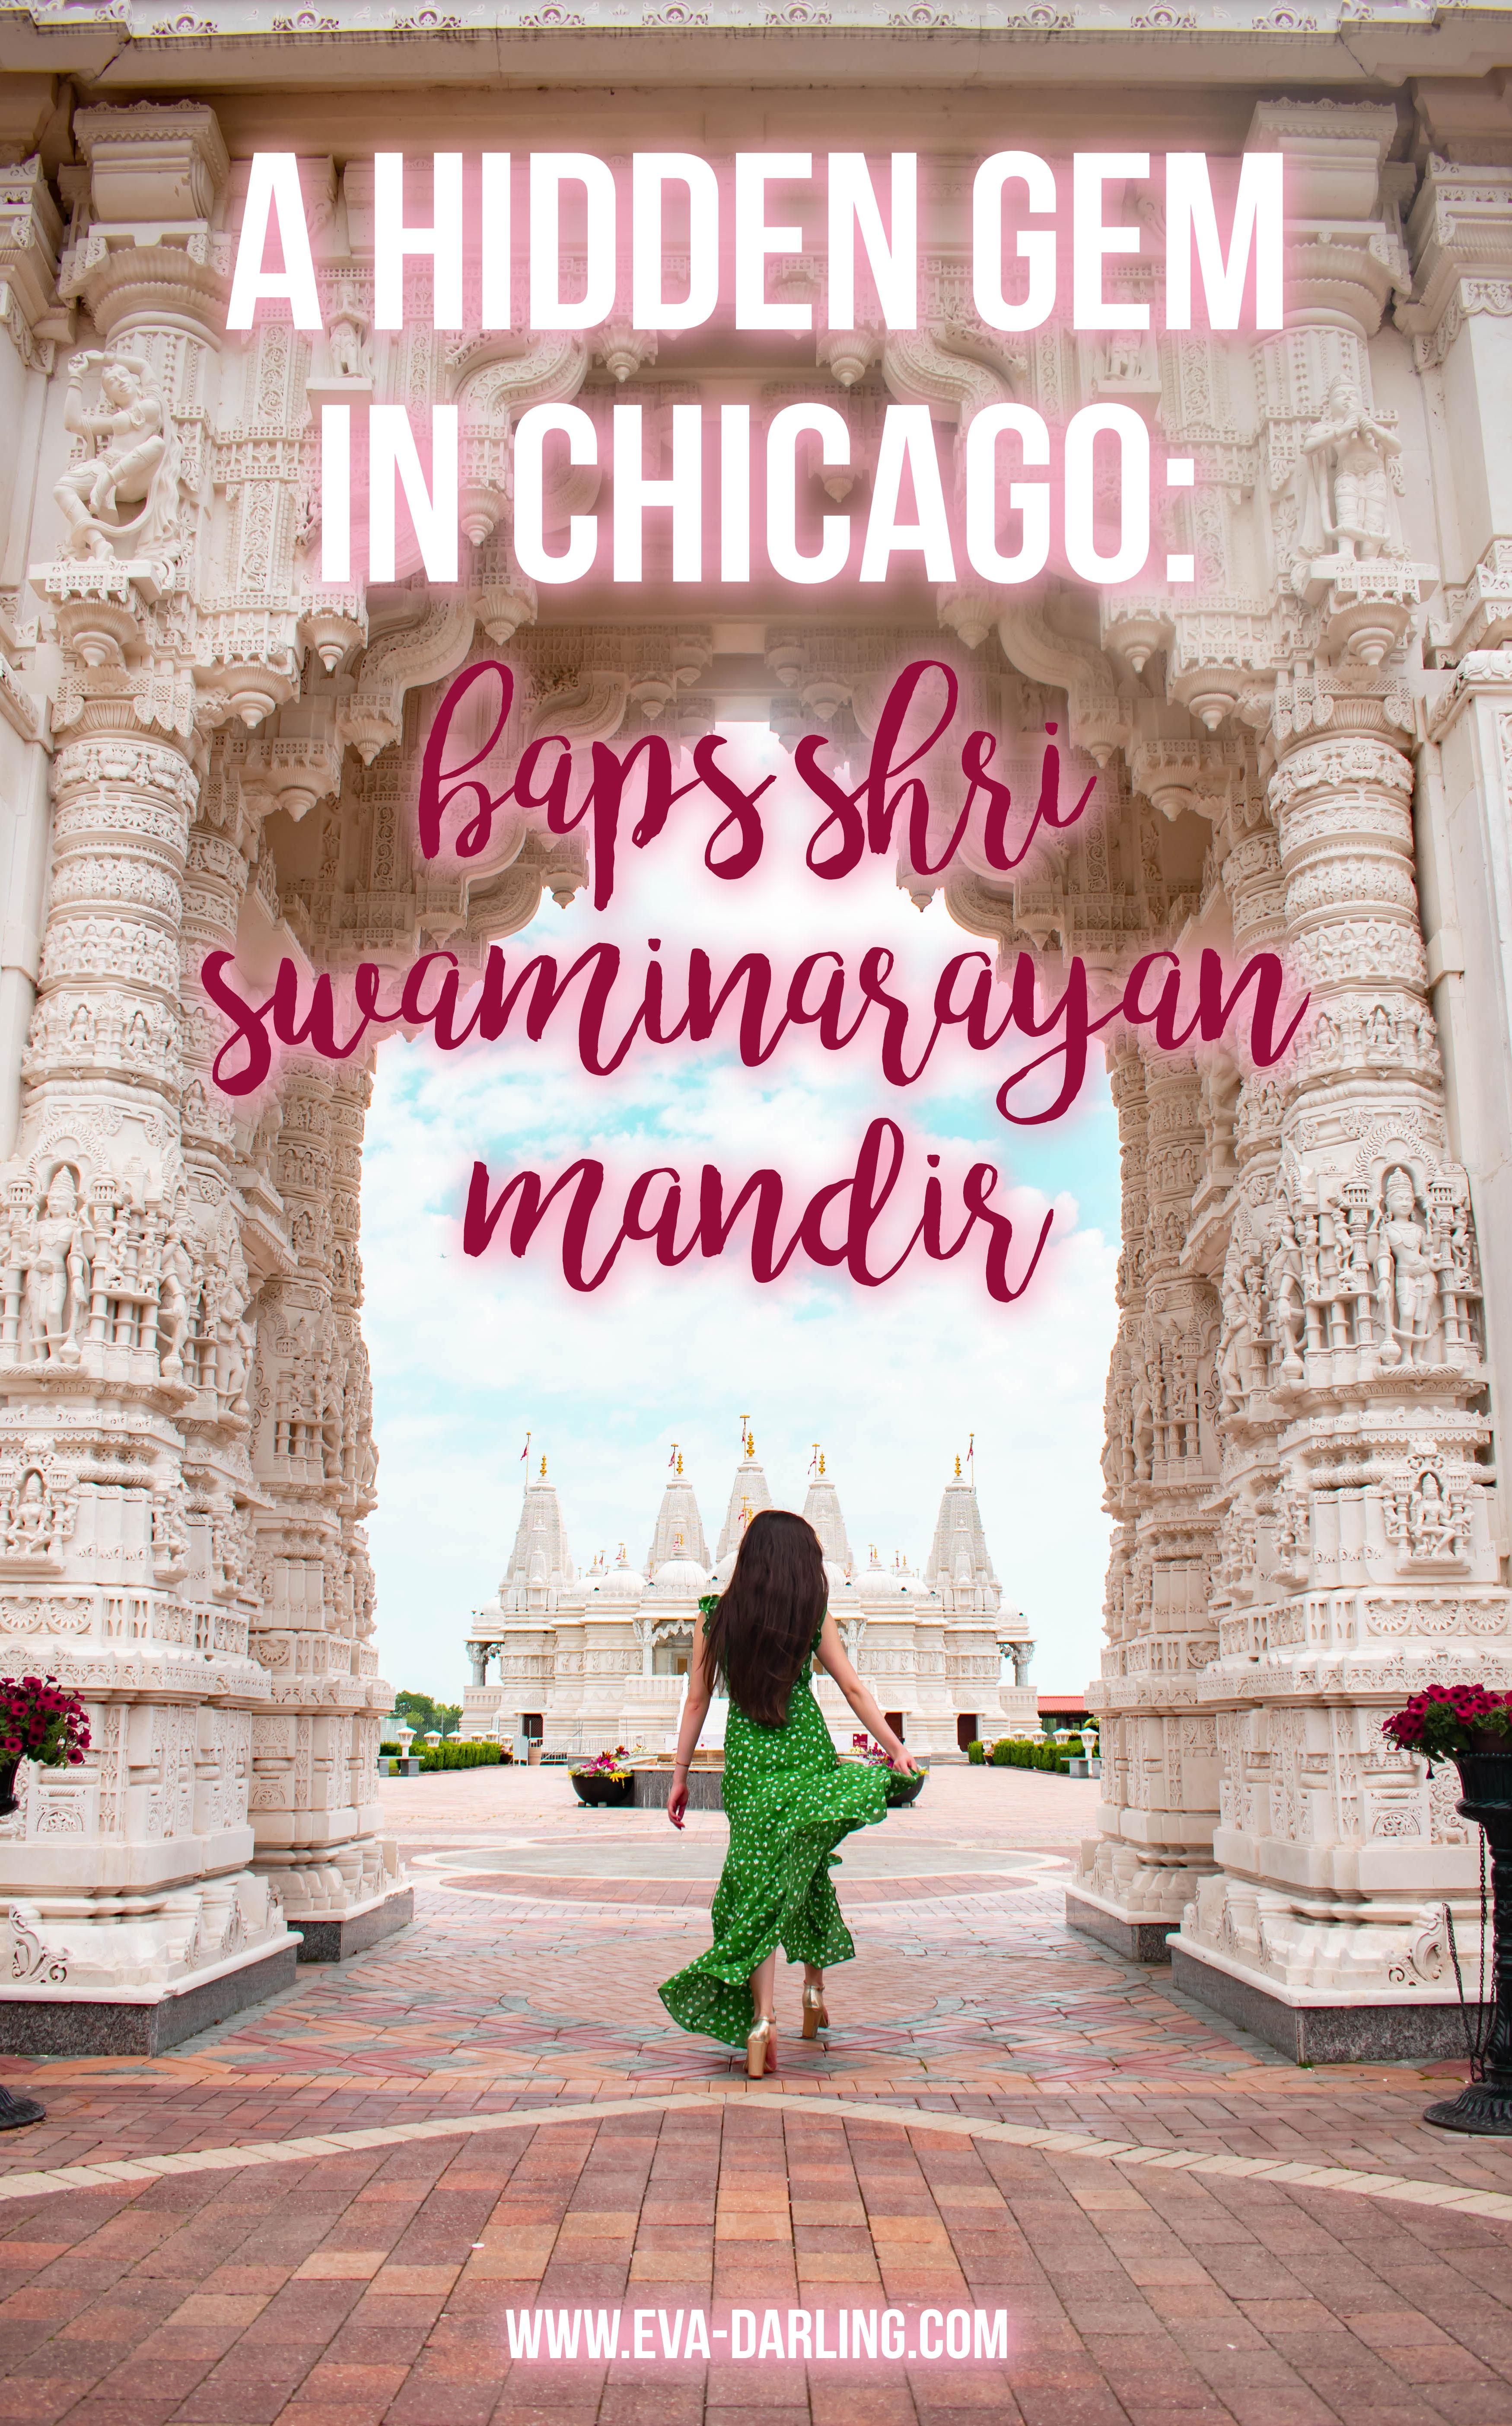 travel blogger eva phan of eva darling baps shri swaminarayan mandir hidden gem chicago illinois things to do in bartlett secret spot chicago unique things to do in chitown chi midwest travel ideas travel guide chicago